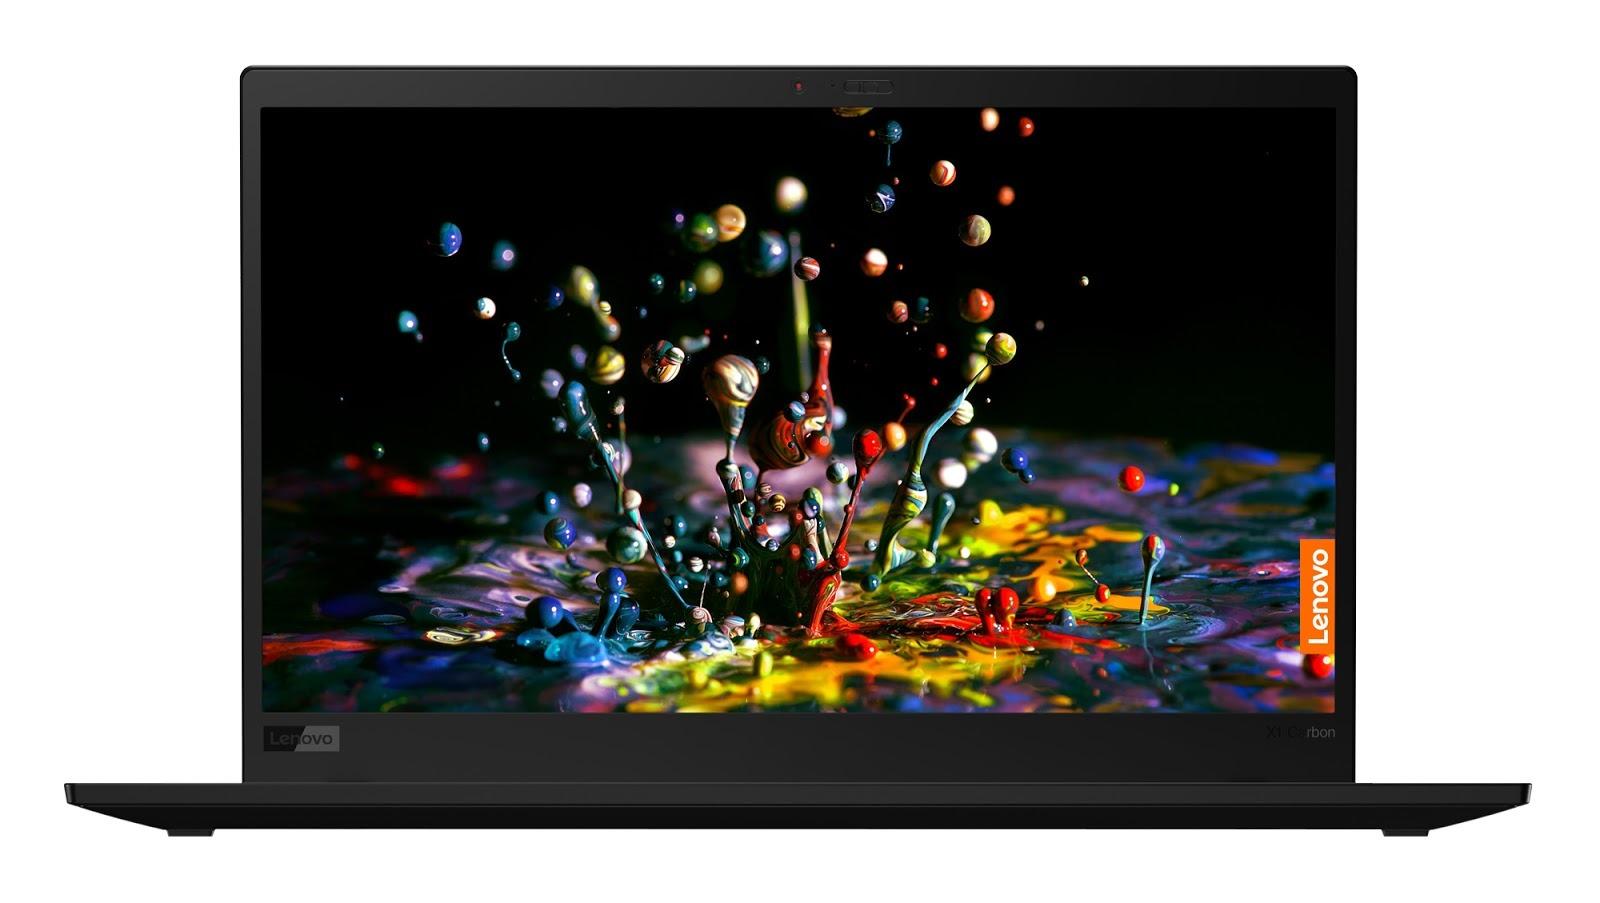 Фото 1. Lenovo ThinkPad X1 Carbon 7th Gen Black (20QD003GRT)